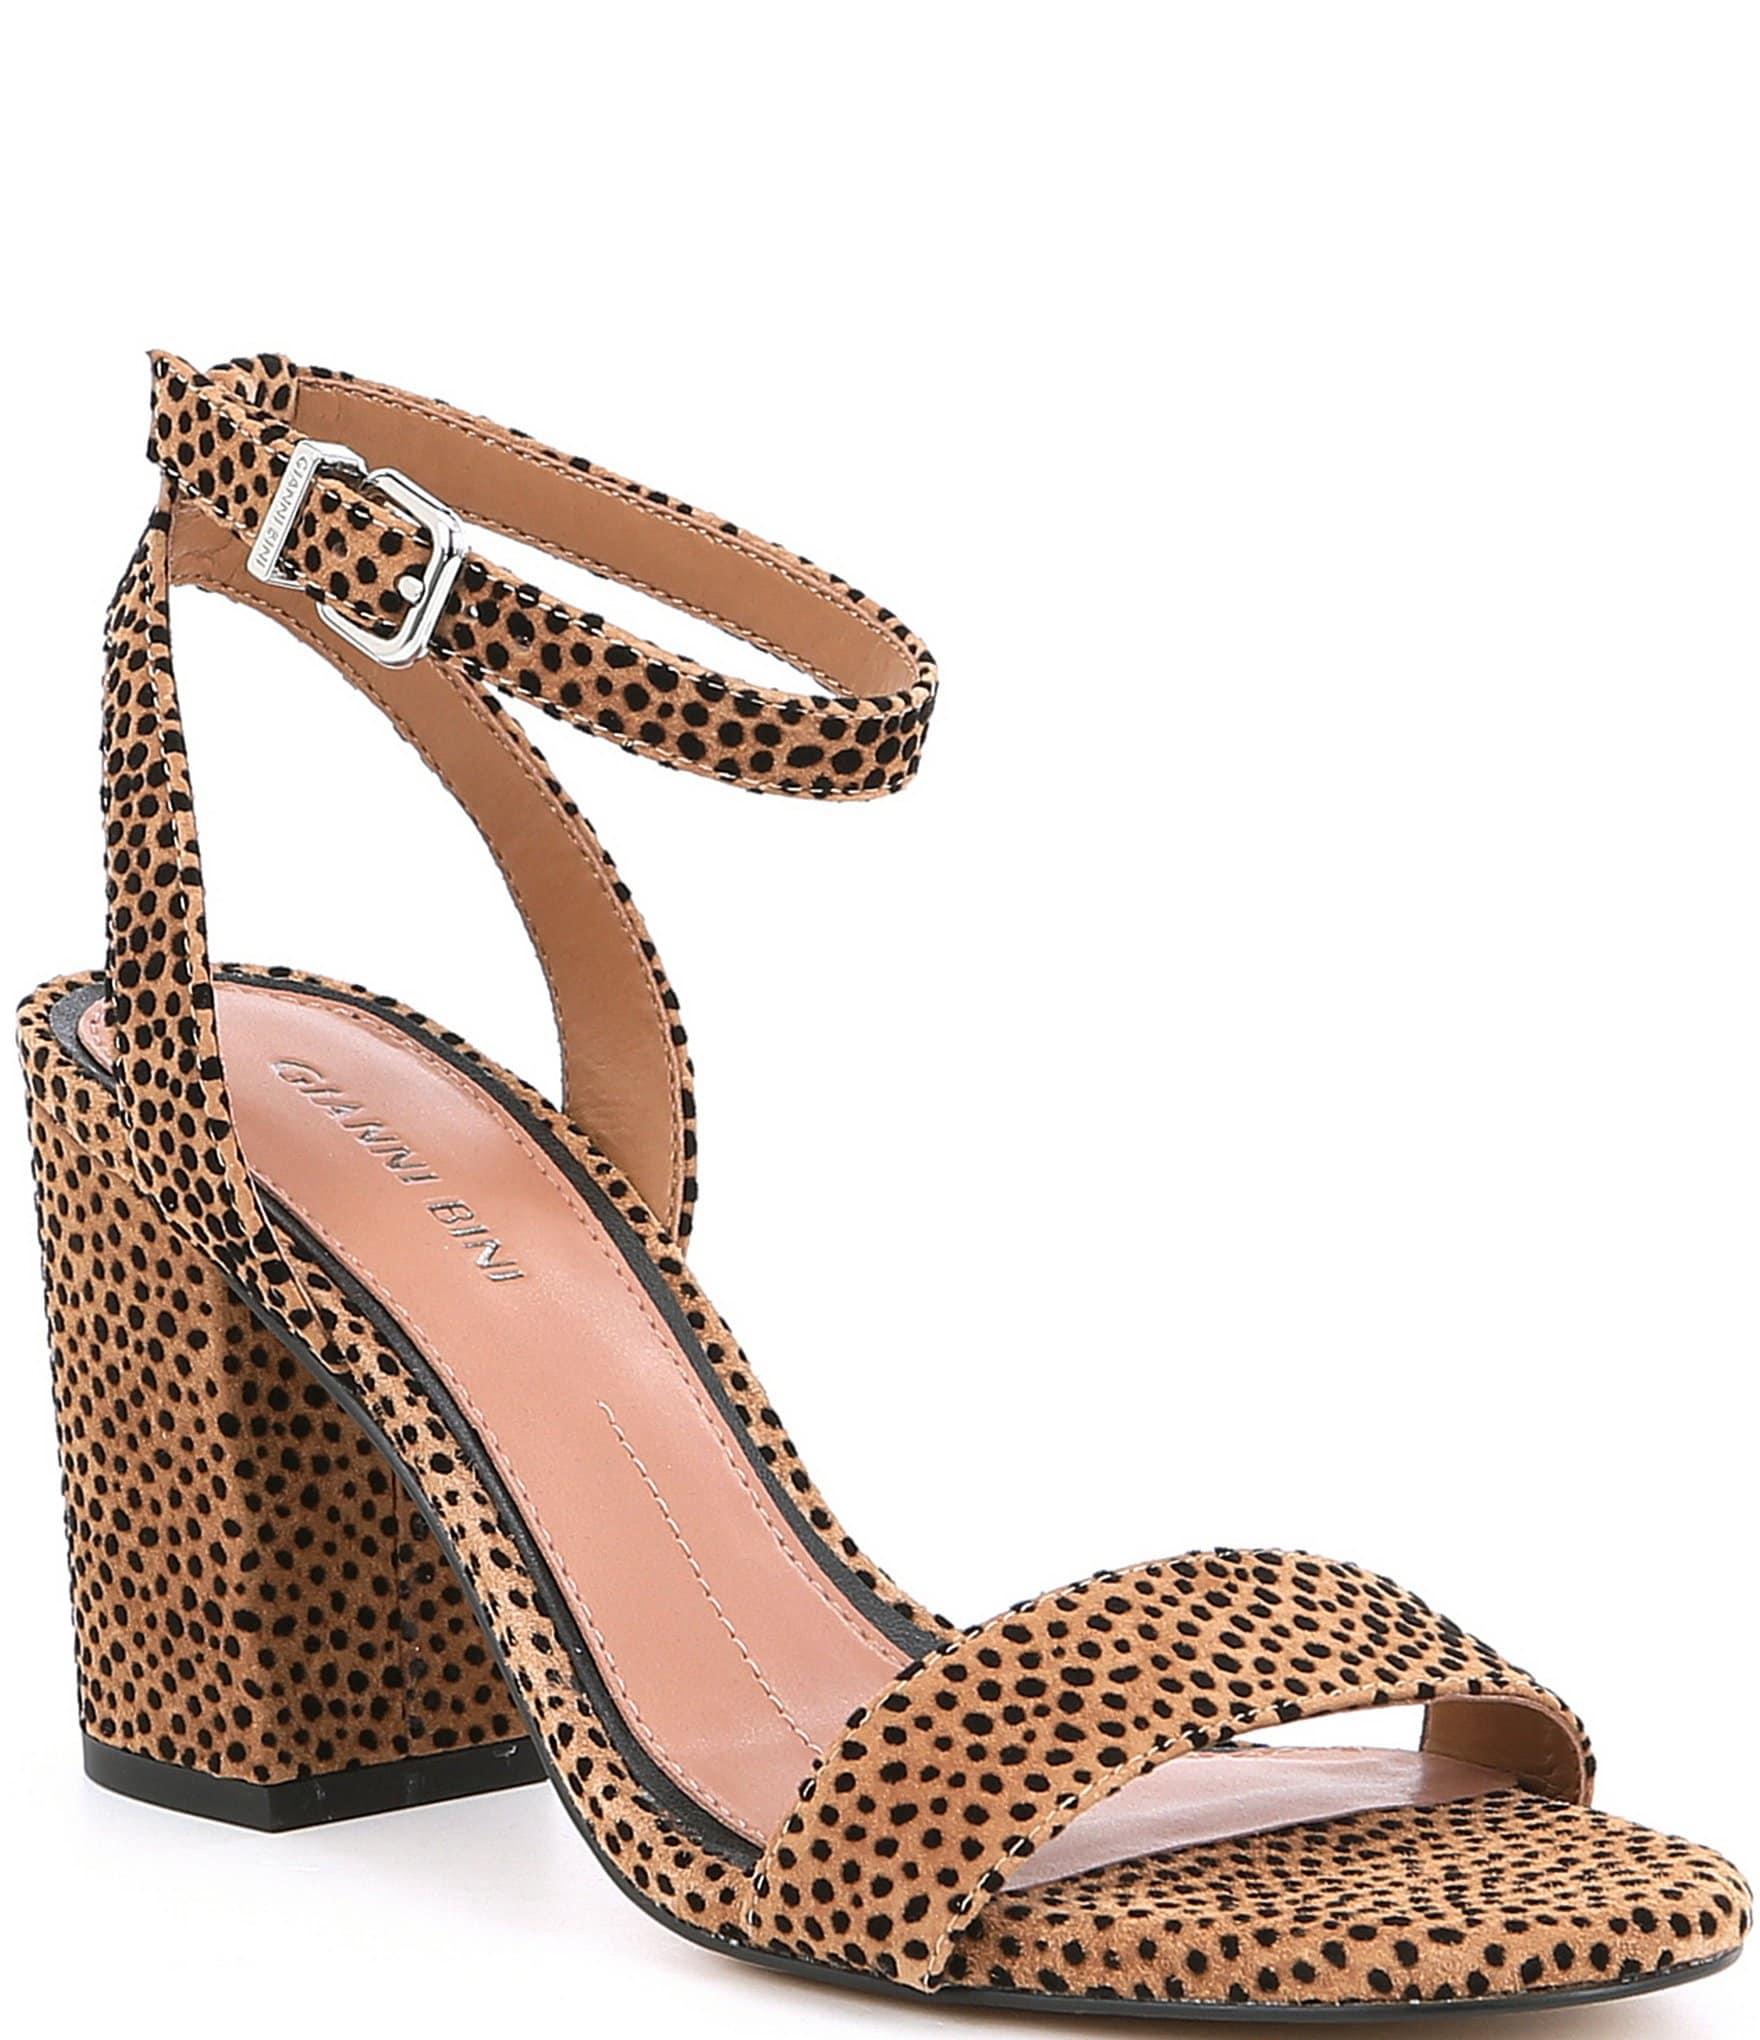 Gianni Bini Arleena Cheetah Print Block